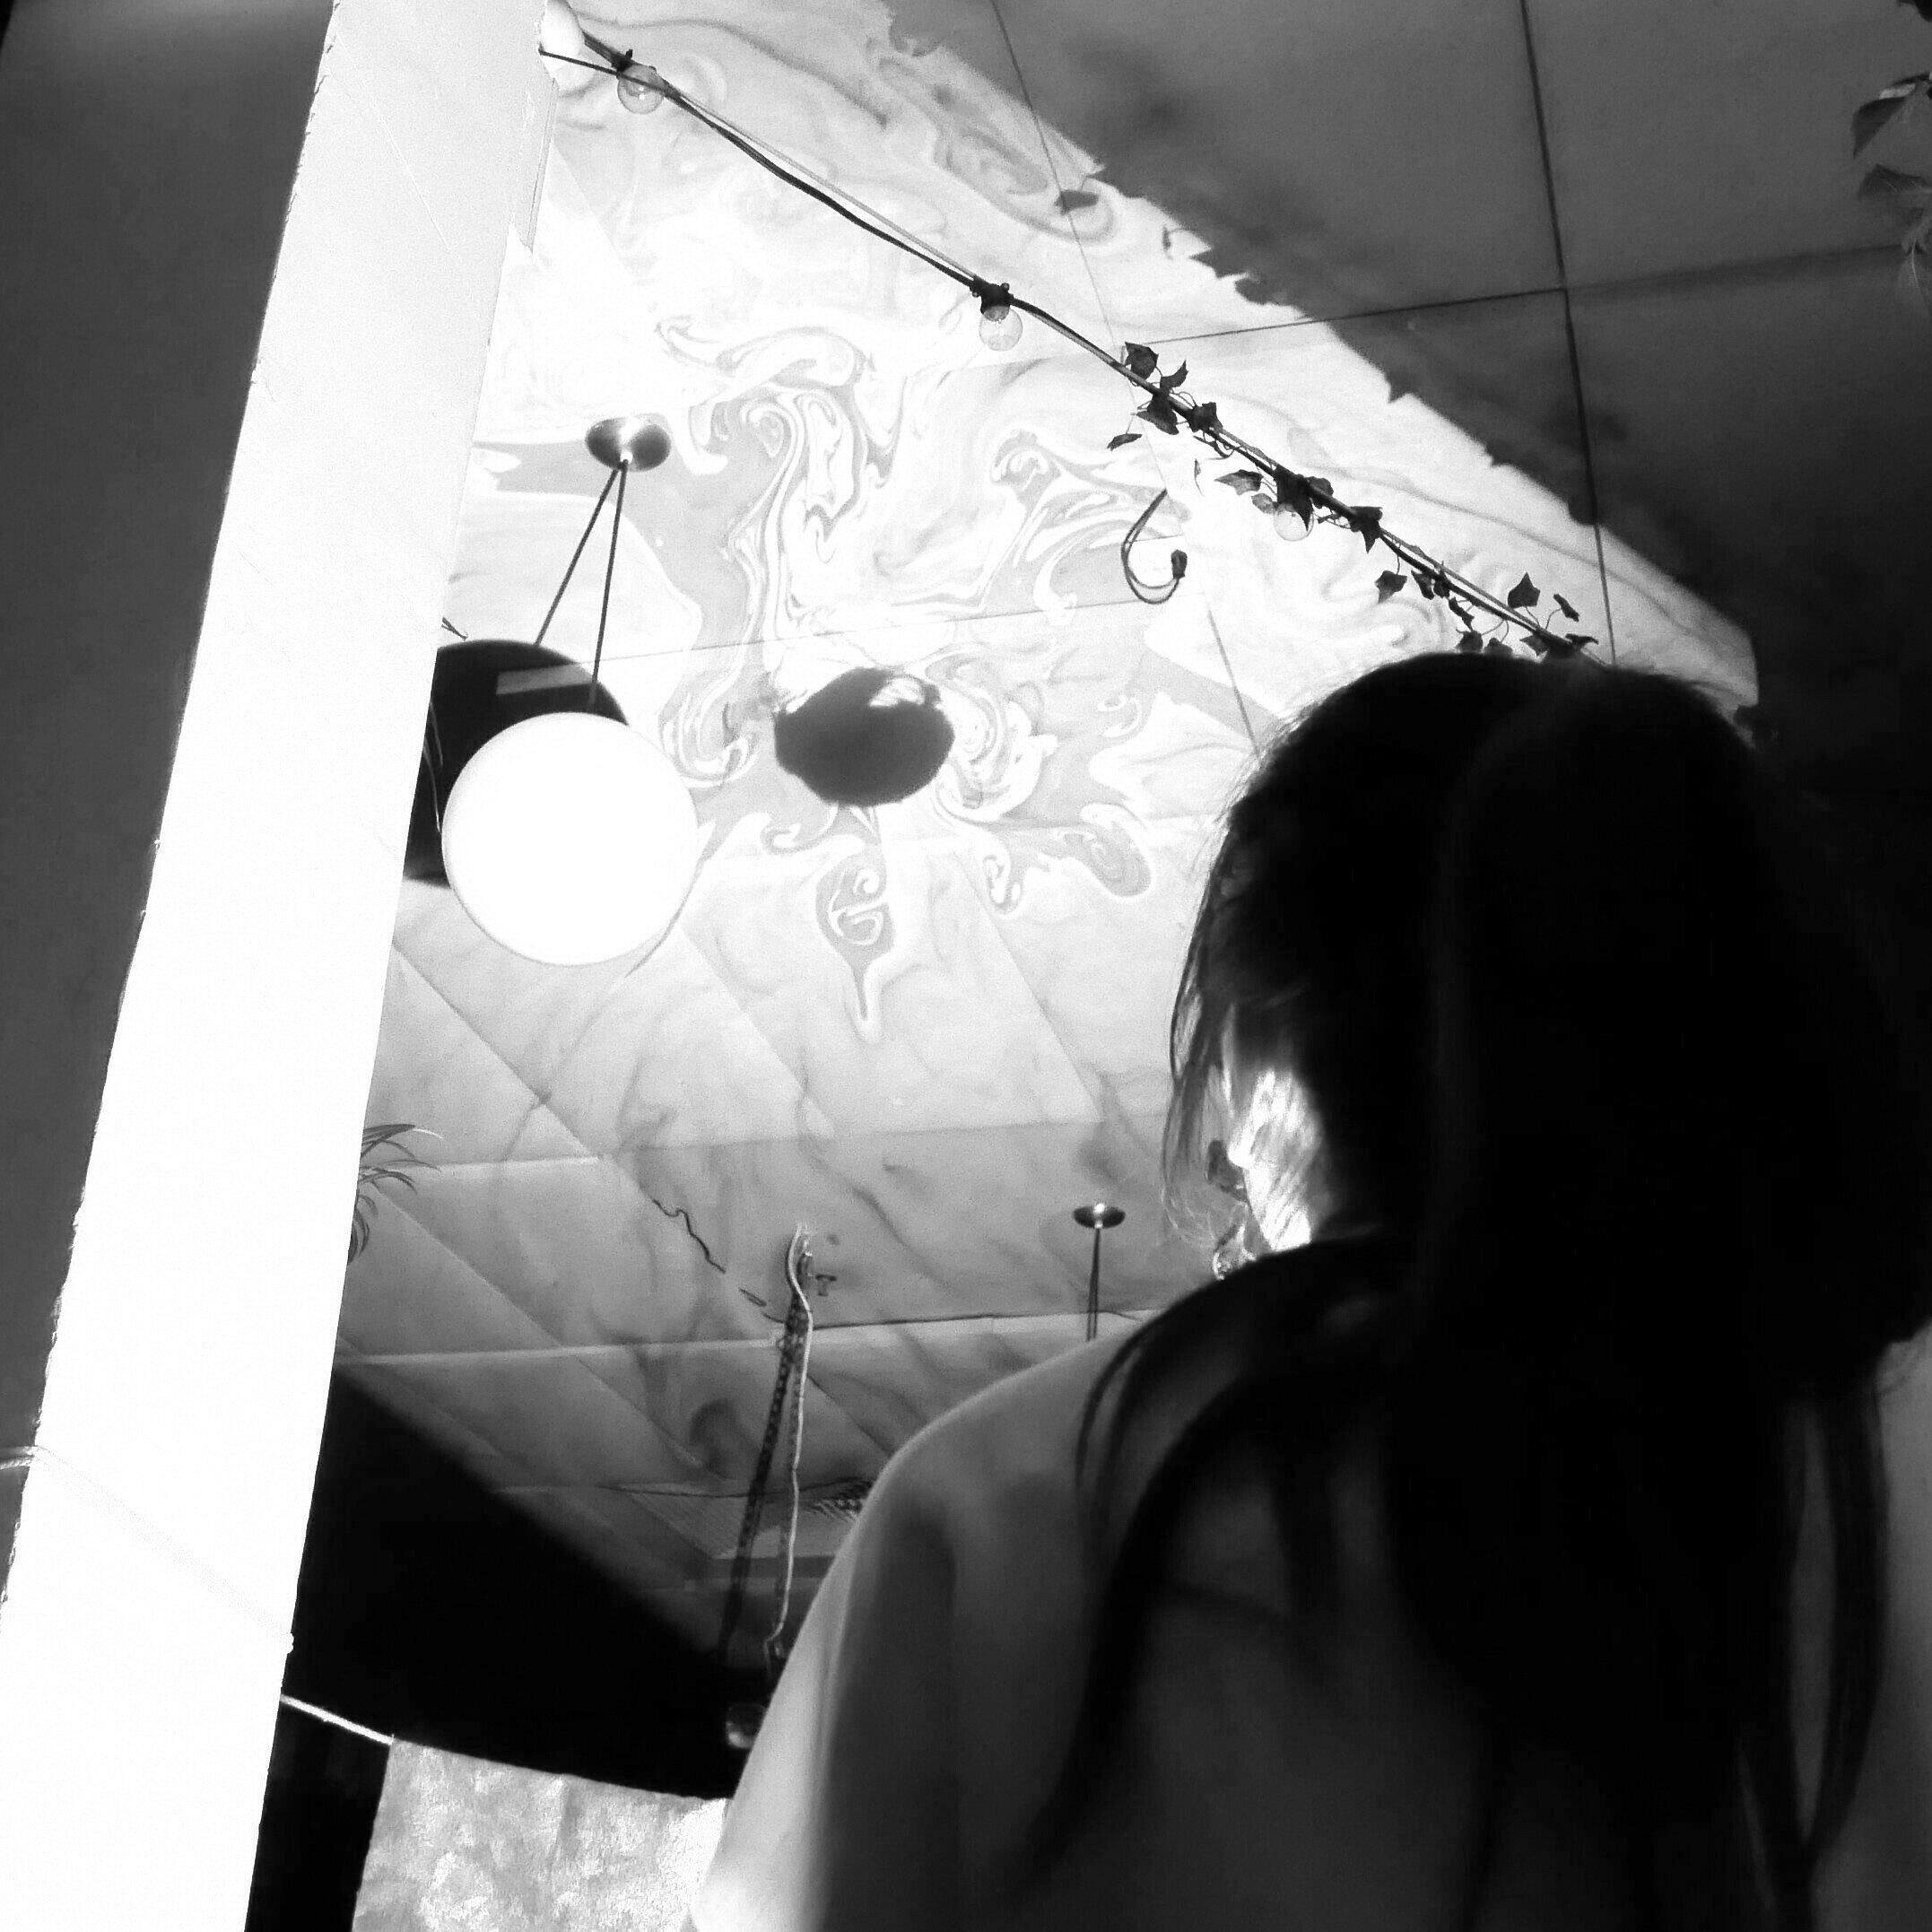 Linh+portrait.jpg